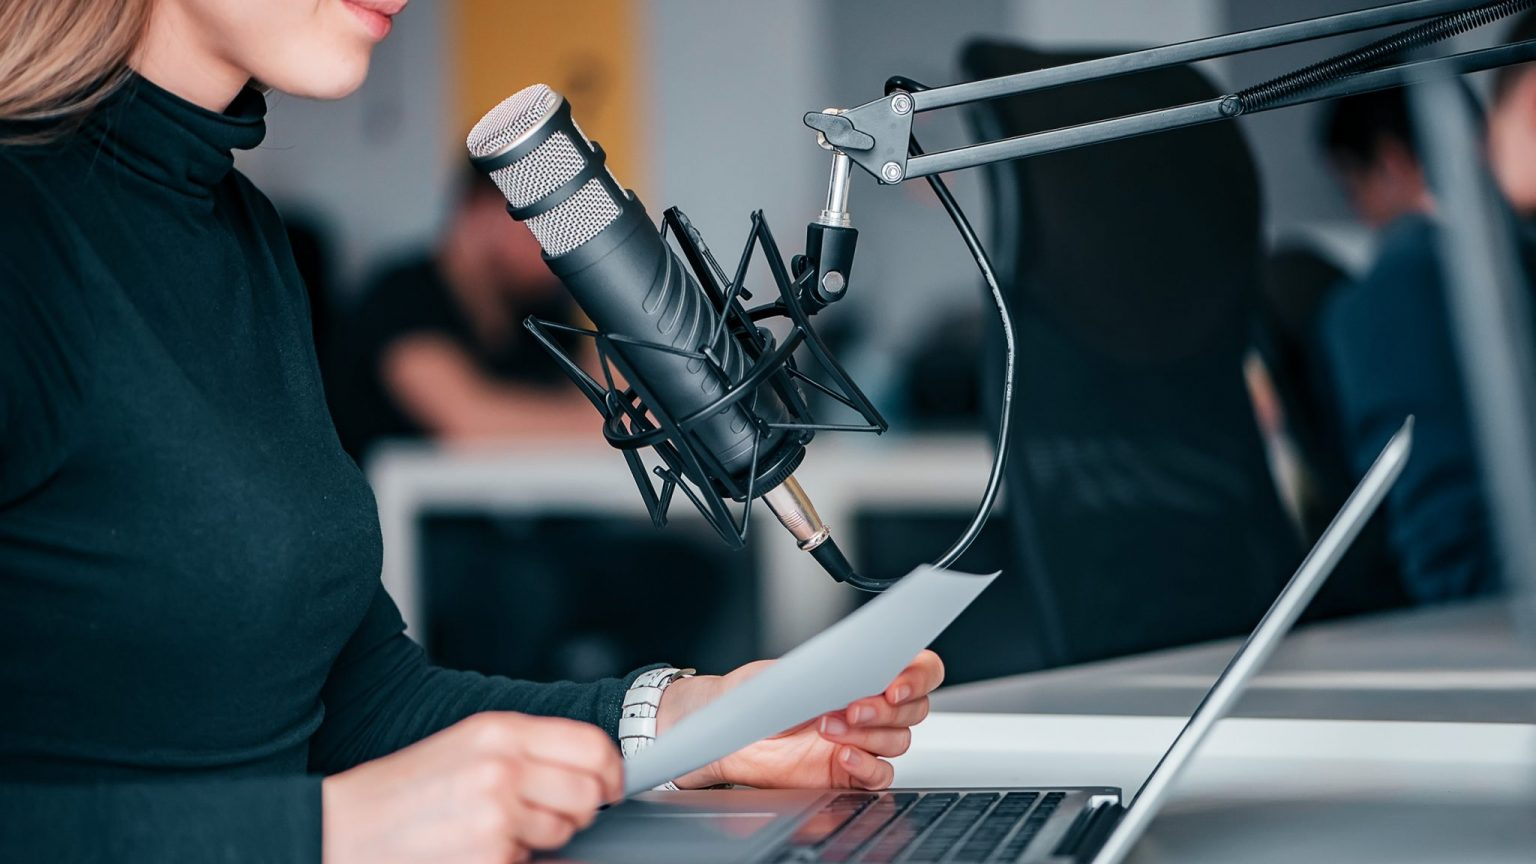 Une personne face à un micro enregistrant un podcast © iStock